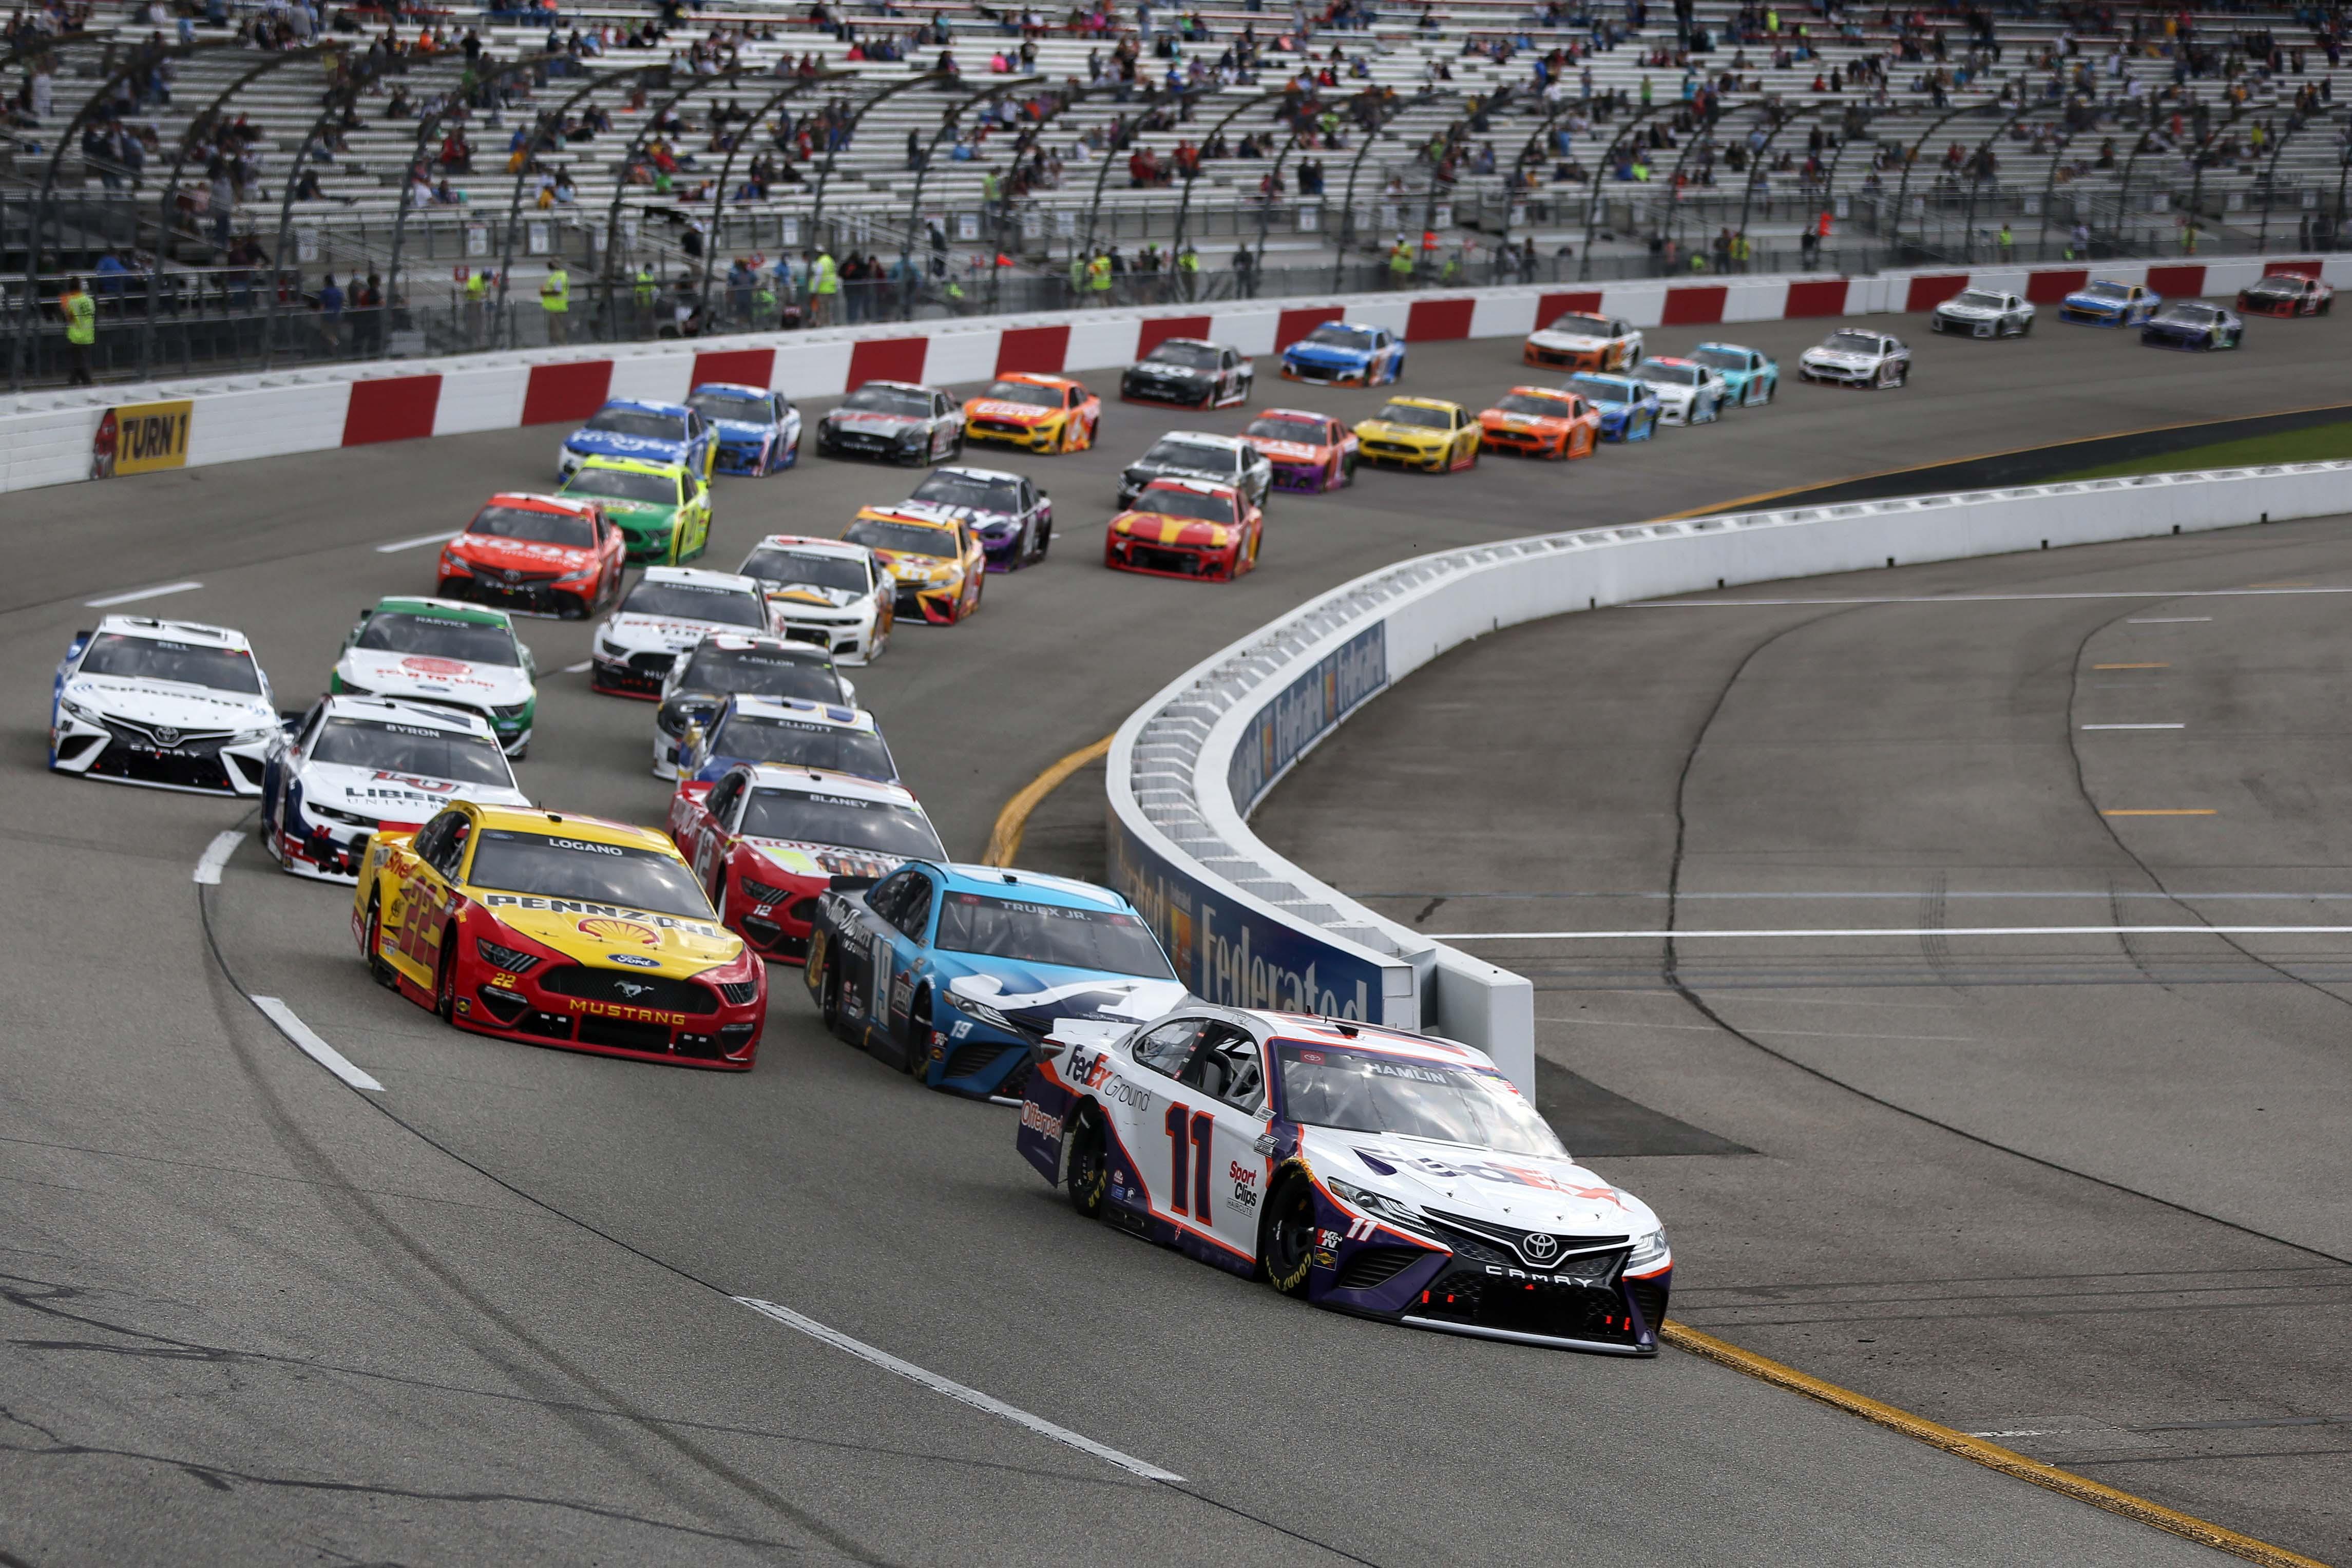 NASCAR Cup Series - Richmond Raceway - Denny Hamlin, Joey Logano, Martin Truex Jr